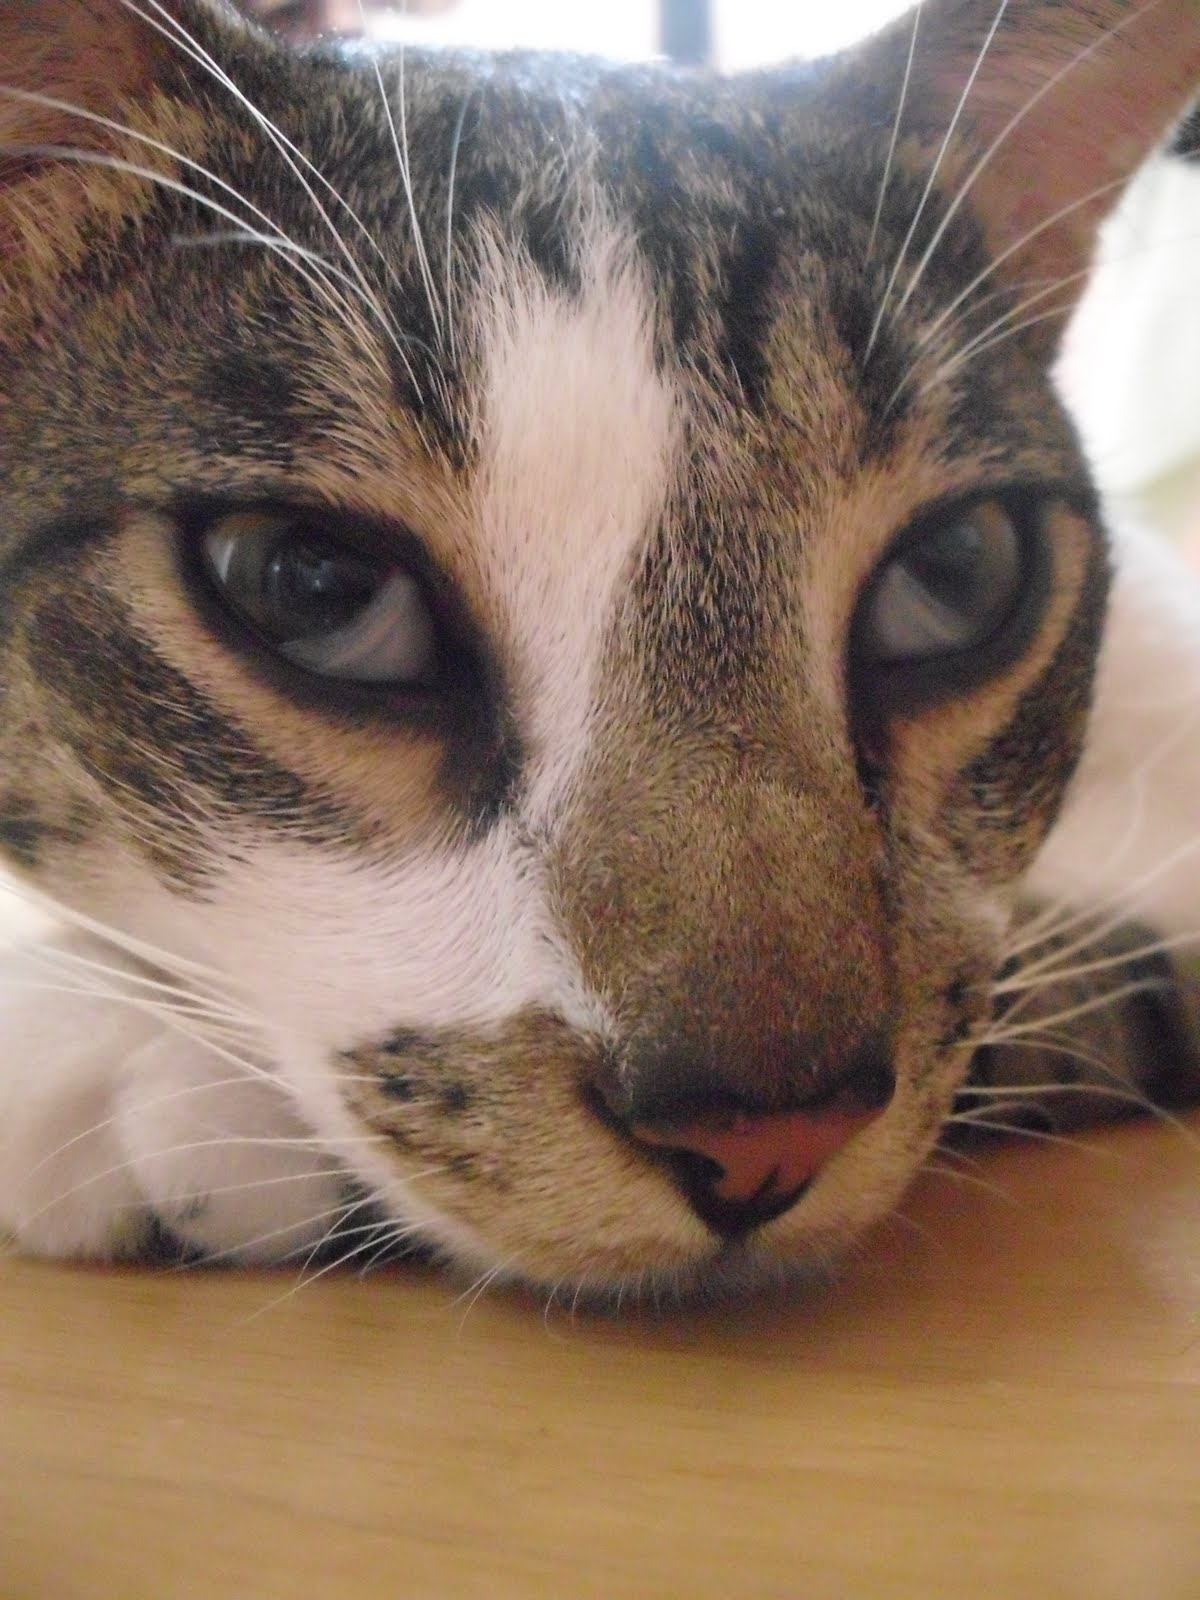 Чем лечить кошке глаза в домашних условиях фото